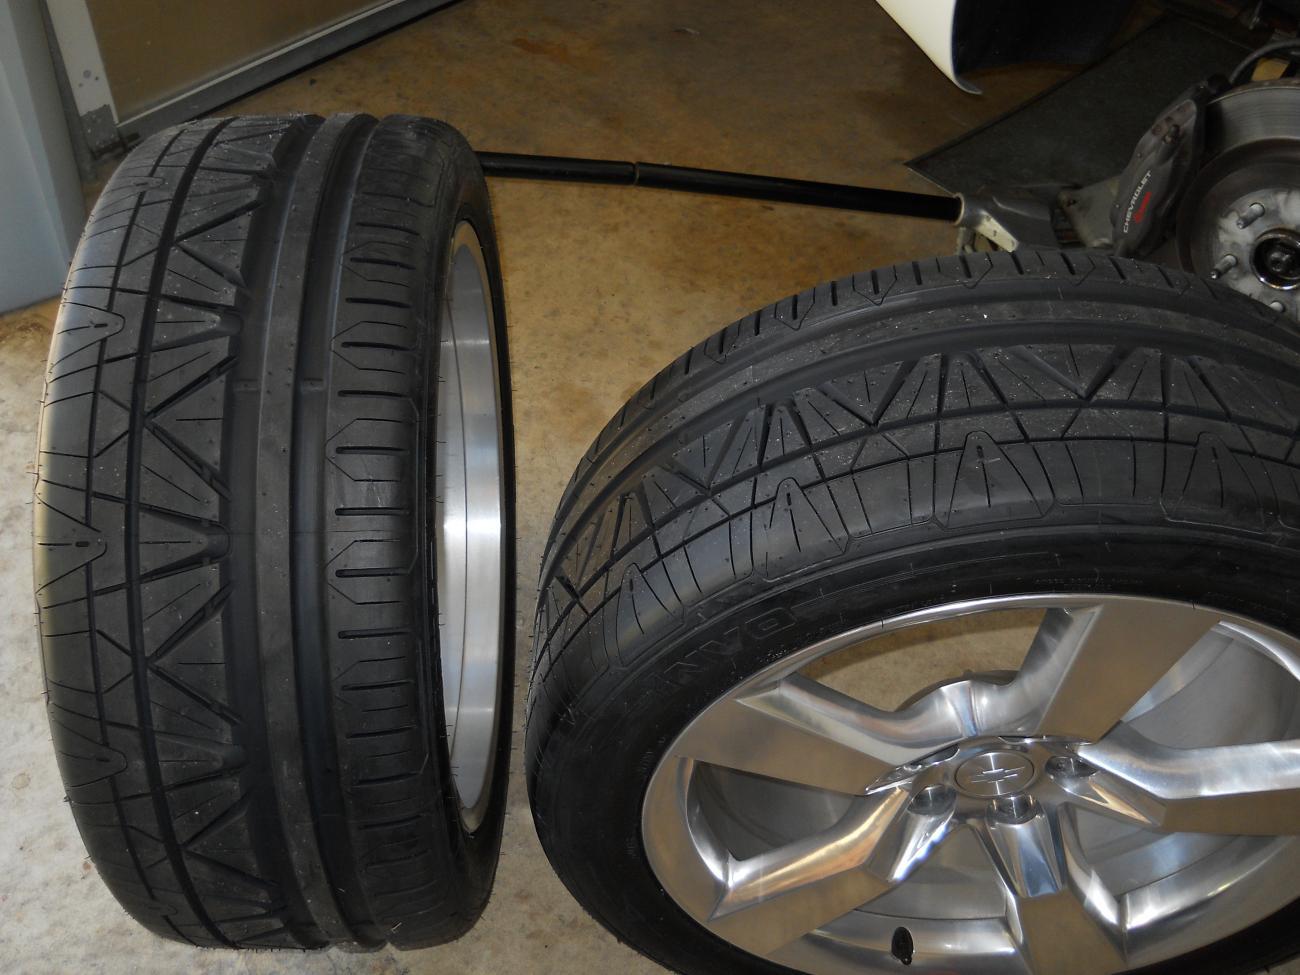 Nitto Motivo Vs Perelli P Zero S Camaro5 Chevy Camaro Forum